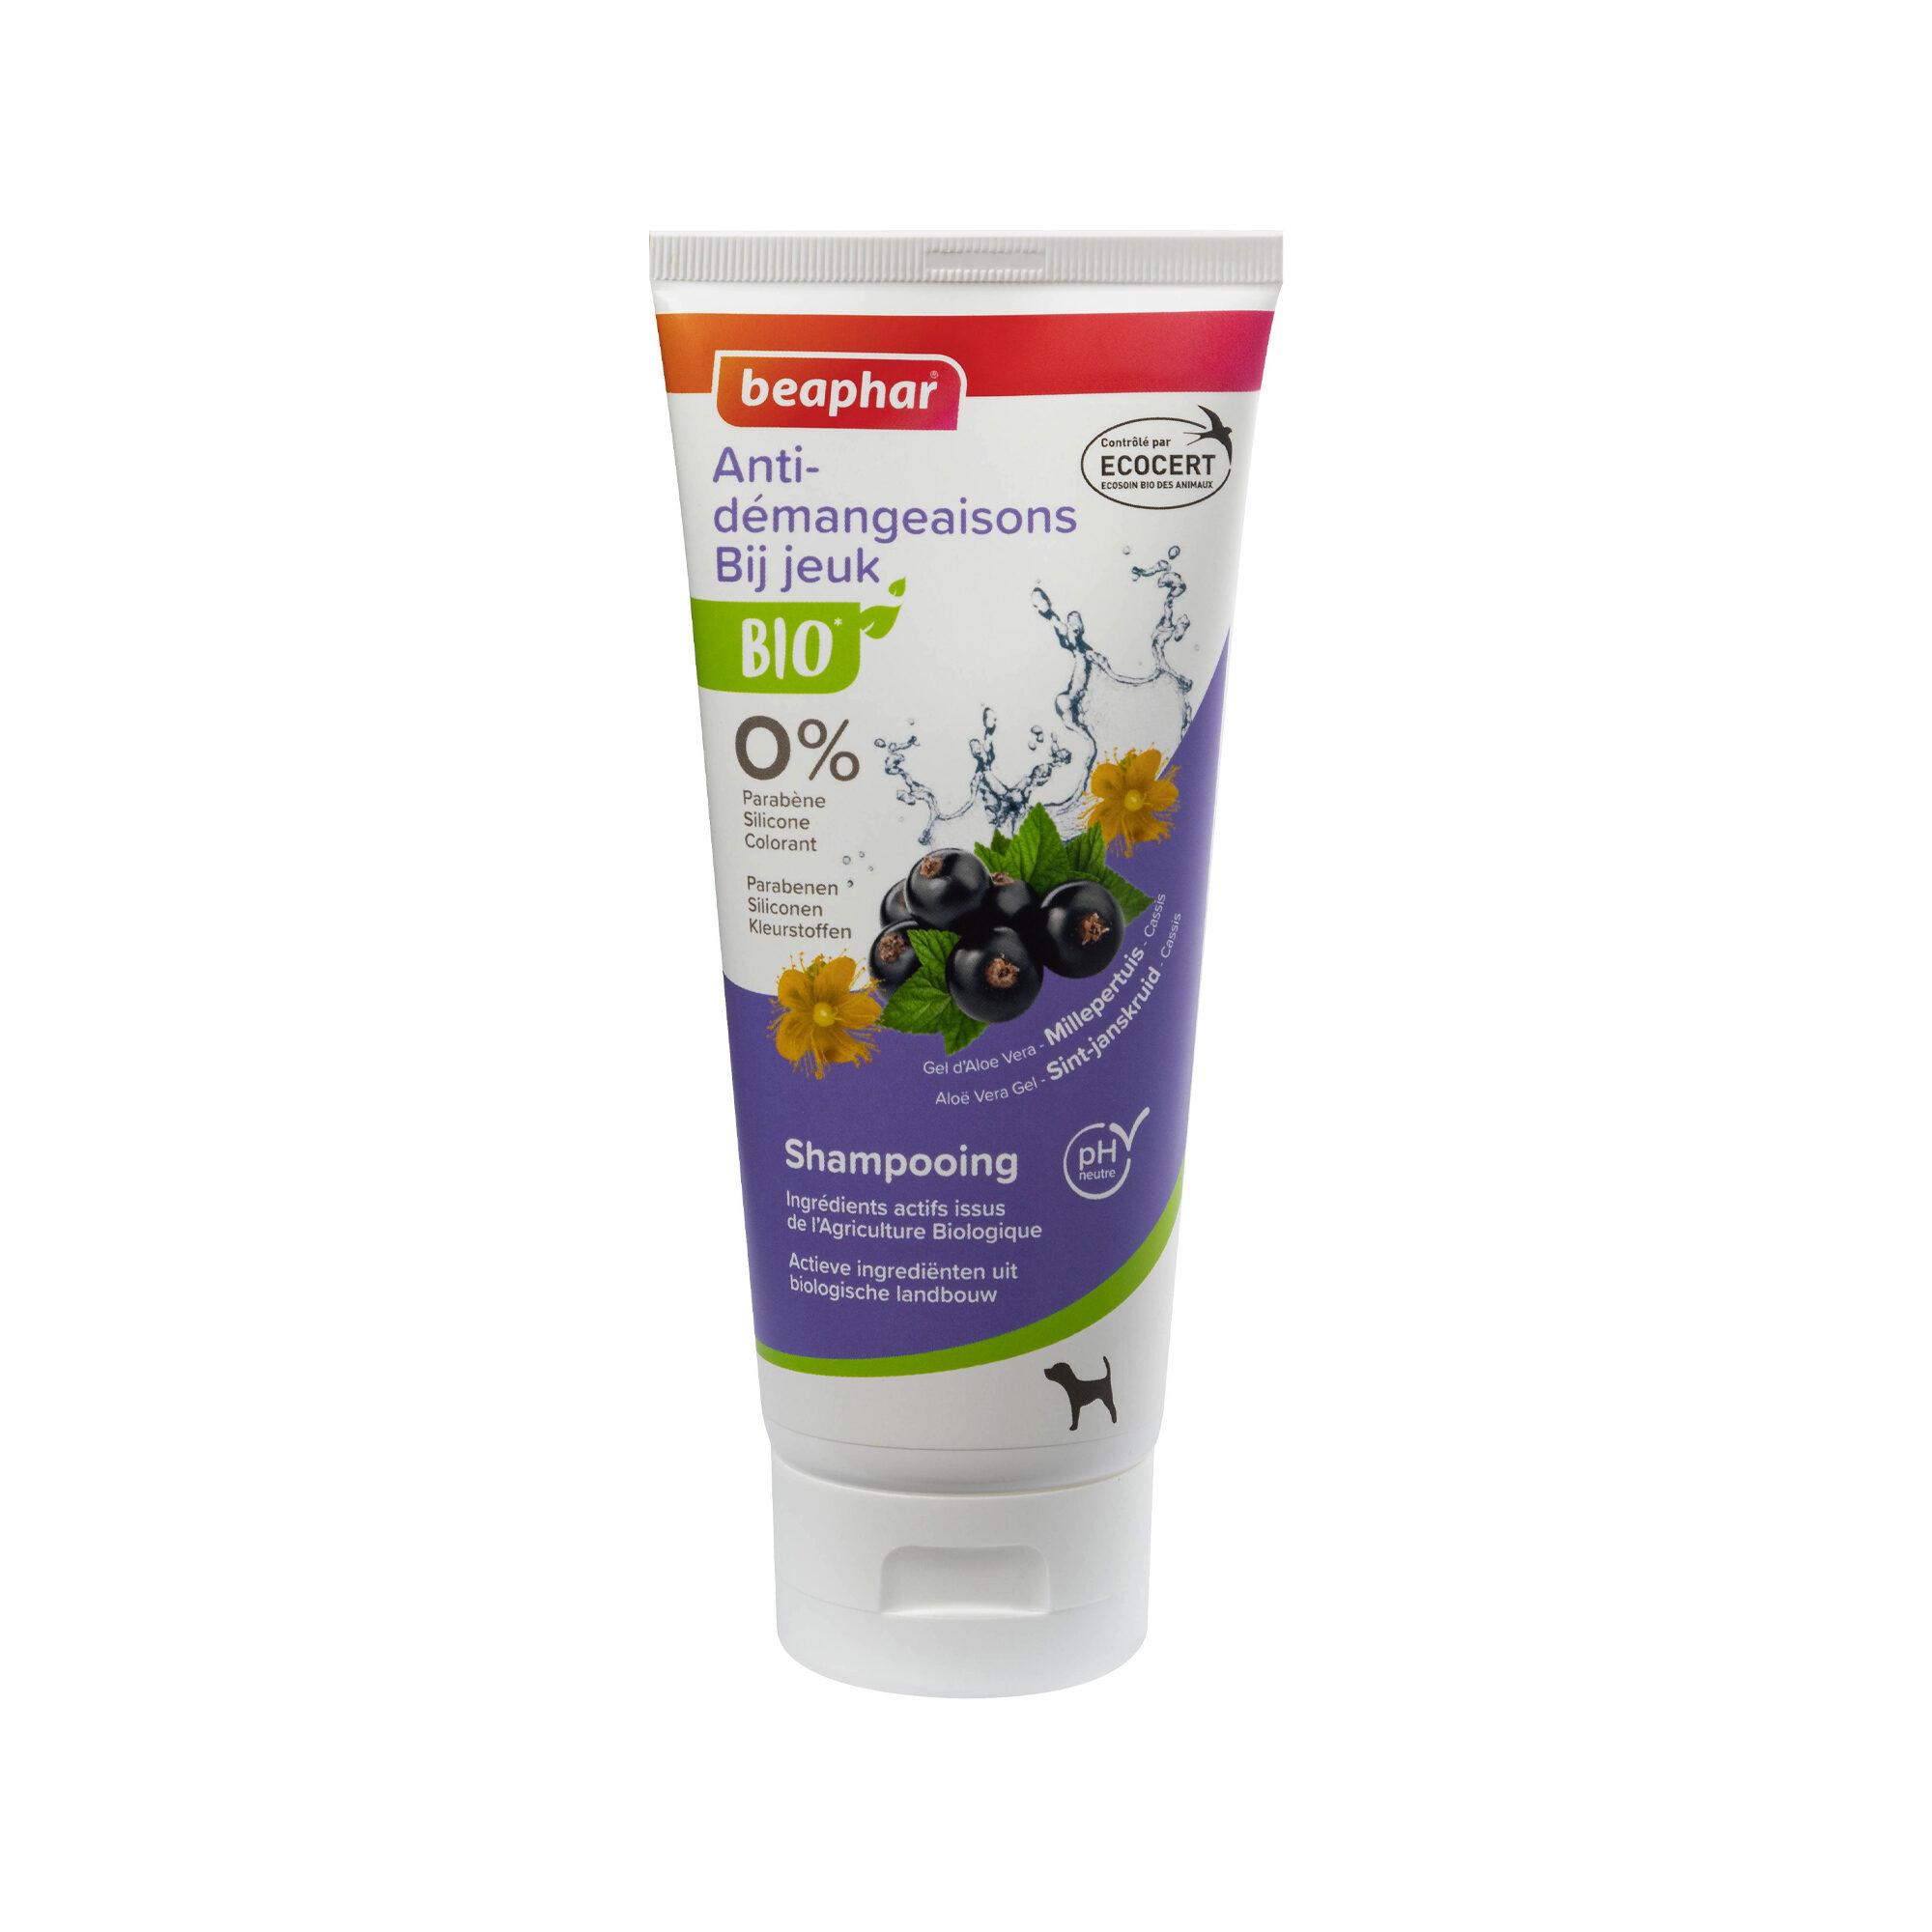 Beaphar Bio - Shampooing pour démangeaisons - Chien